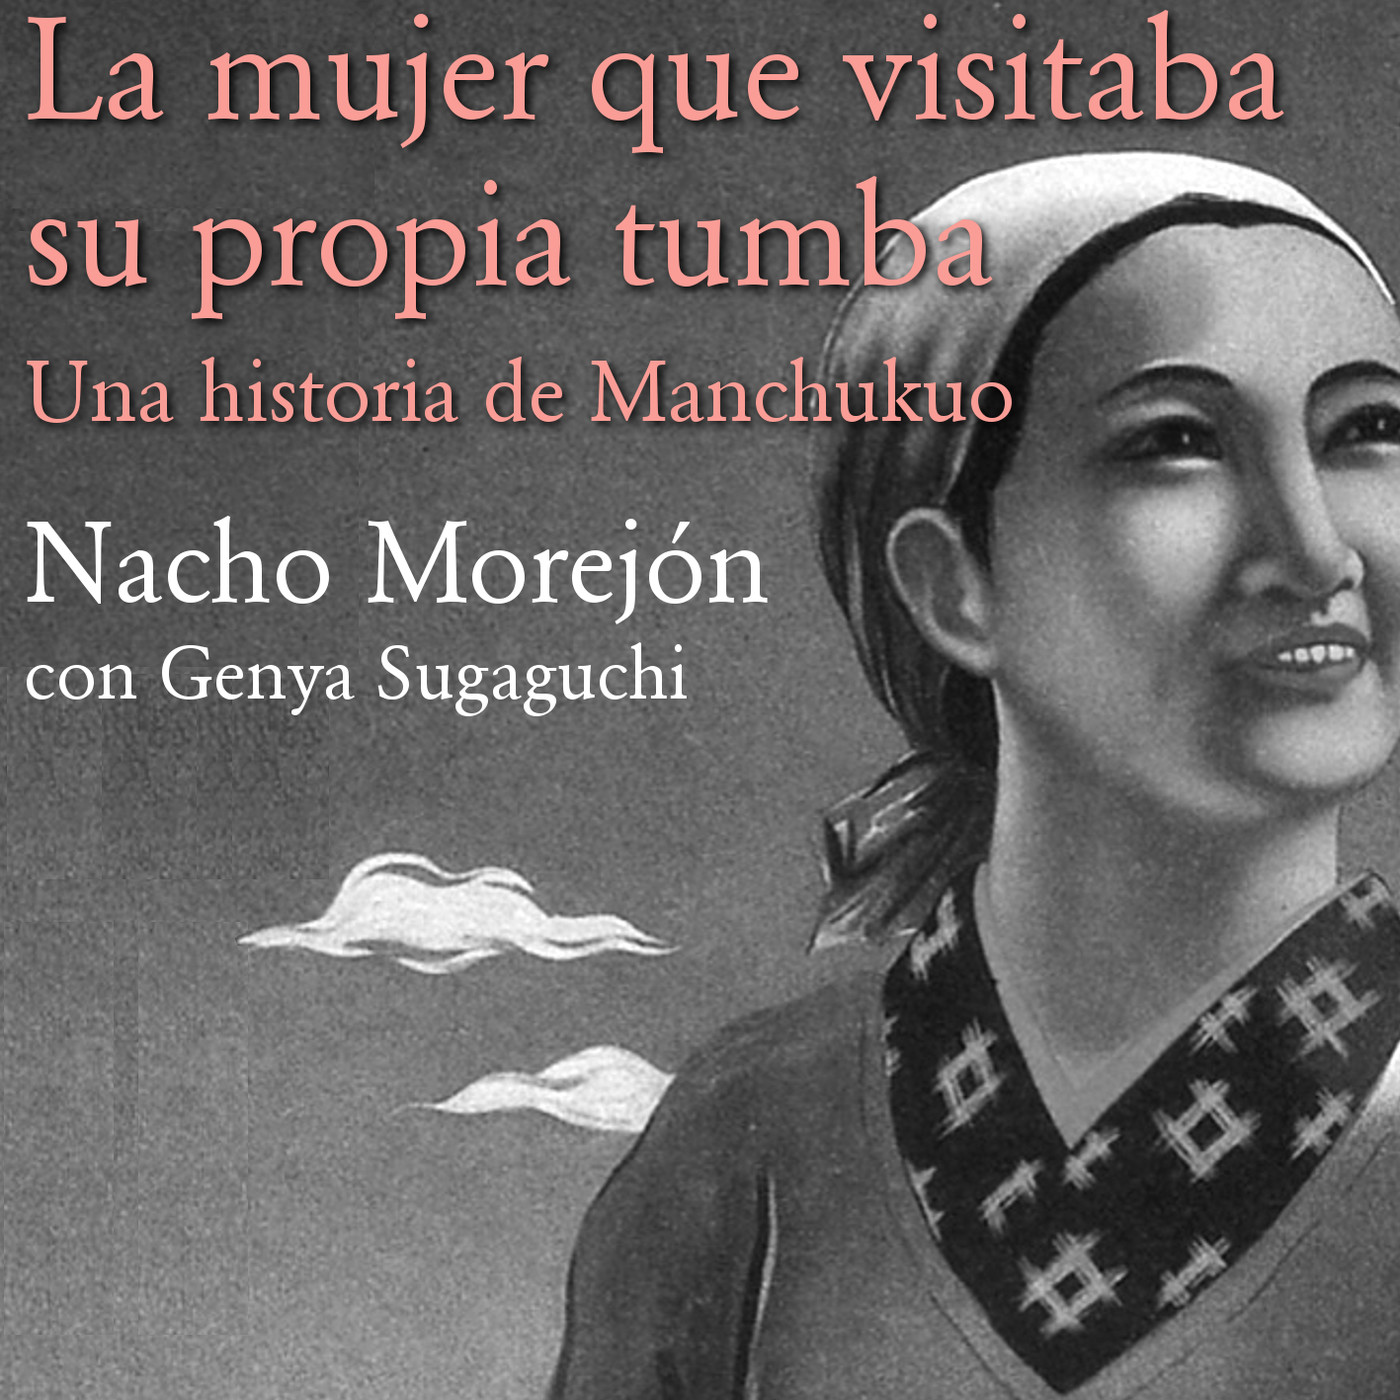 Nacho Morejon